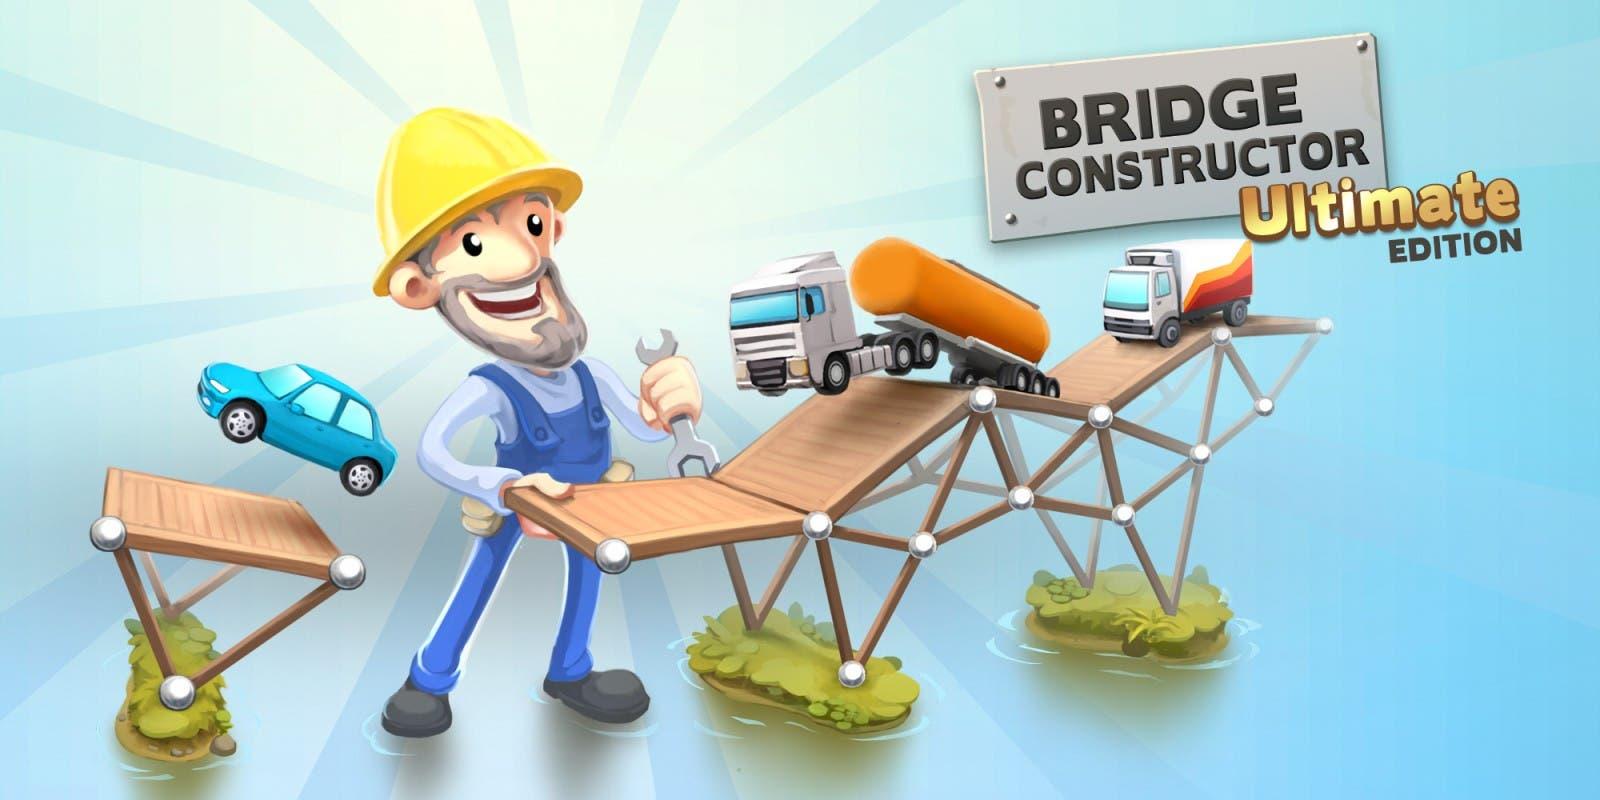 BridgeConstructorUltimateEdition MainArt 1600x800